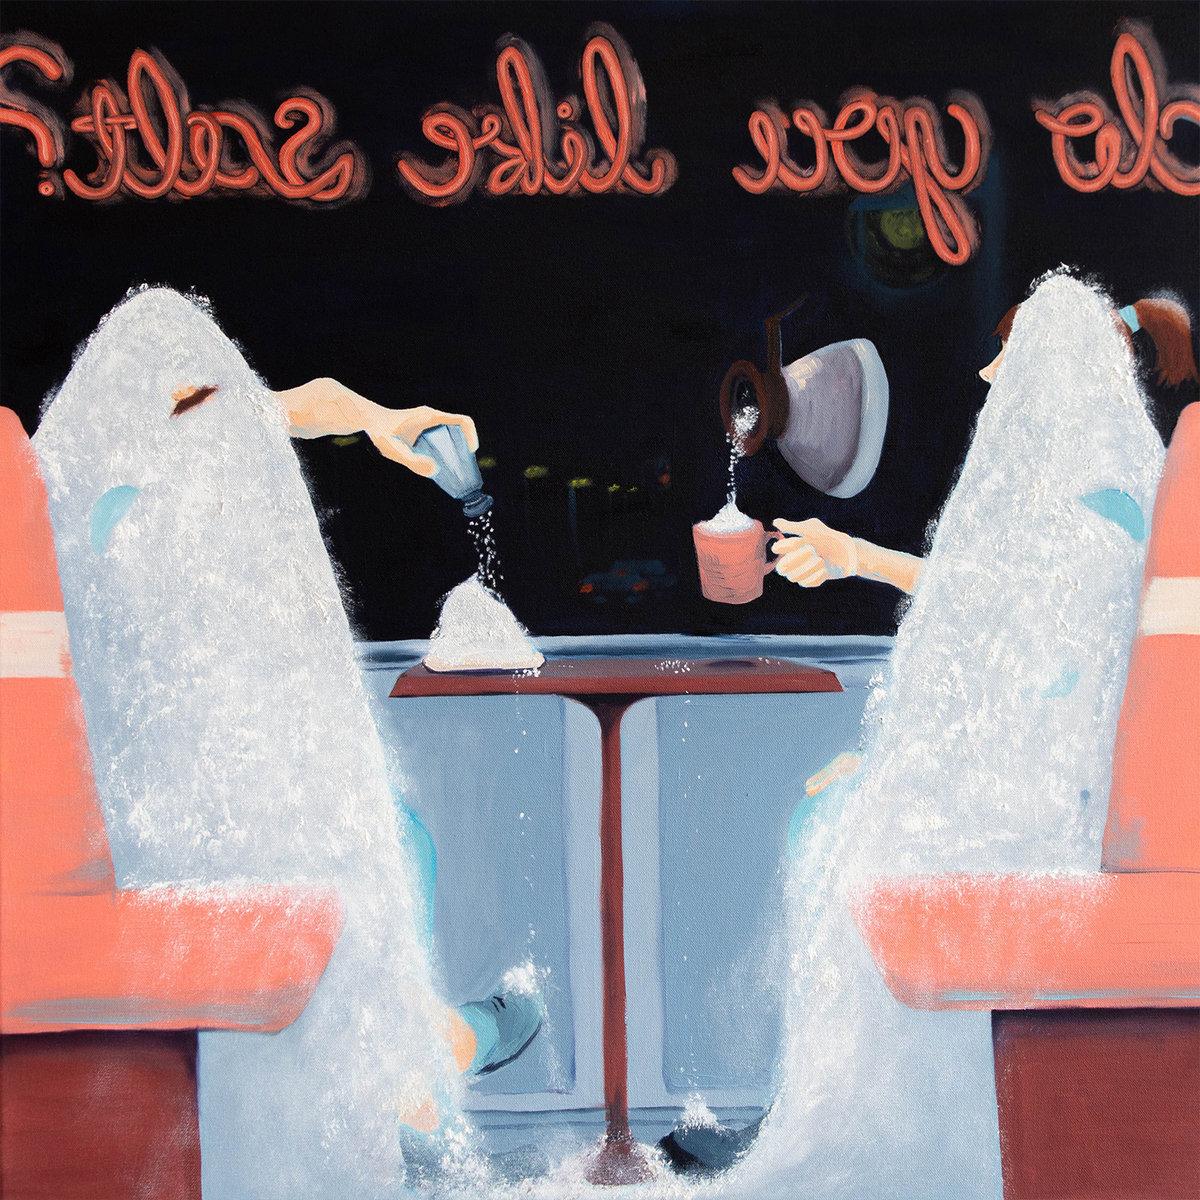 BRNDA - Do You Like Salt?